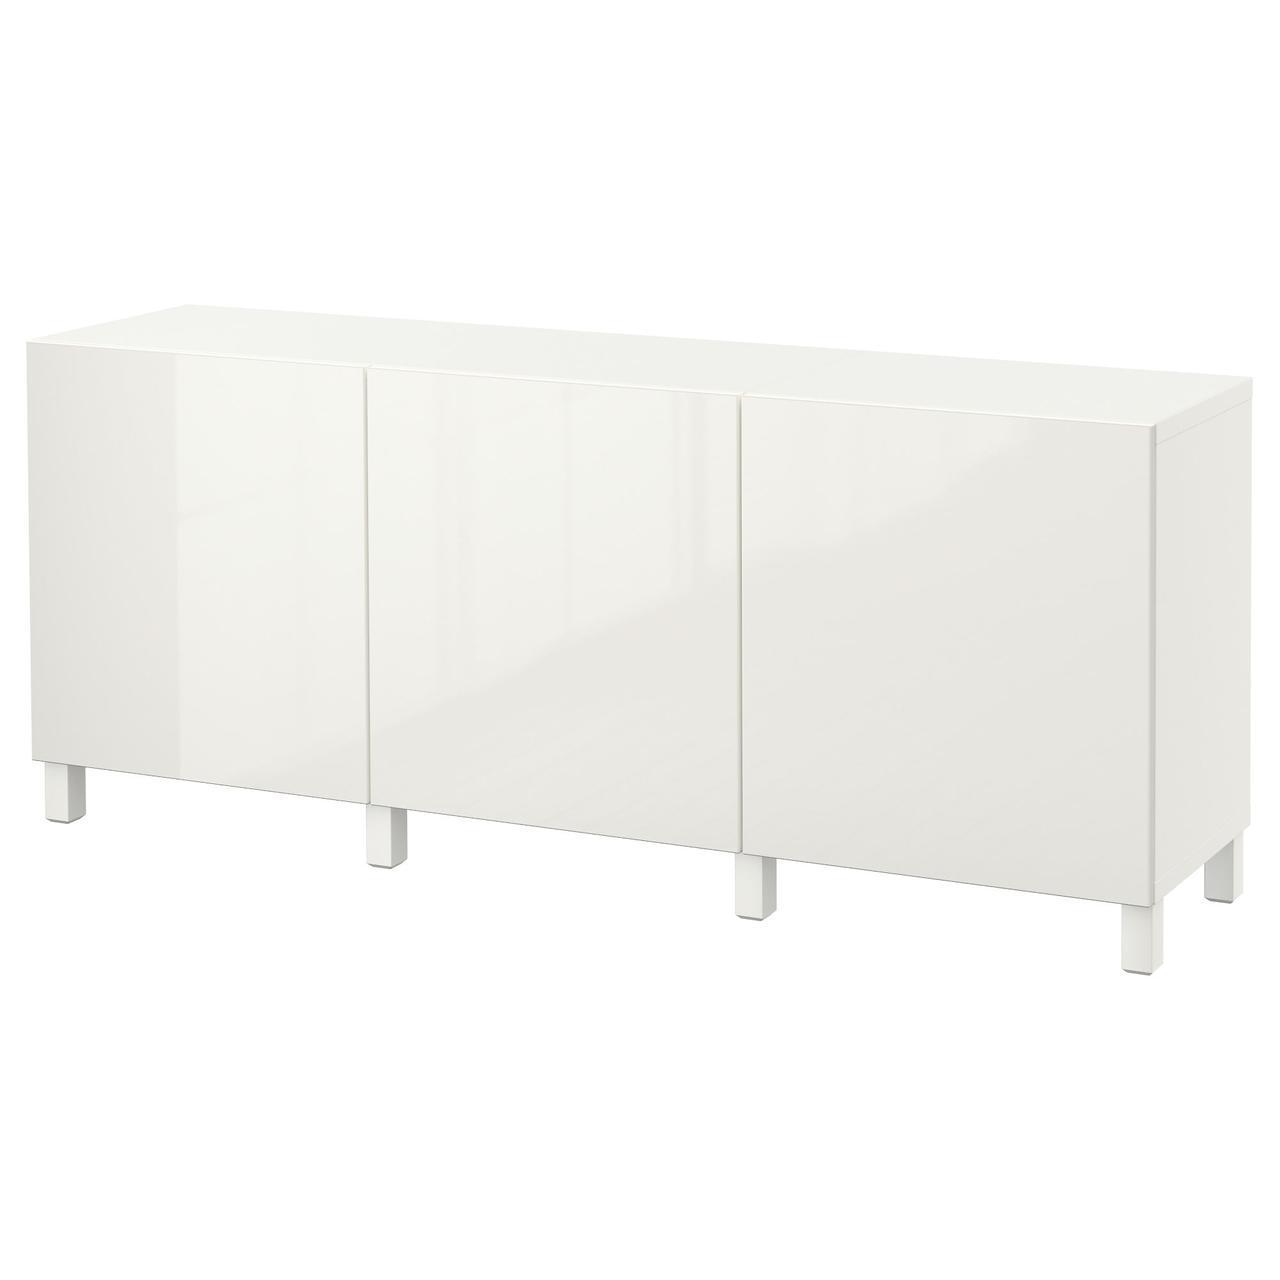 IKEA BESTA (891.398.19) Сервант/буфет